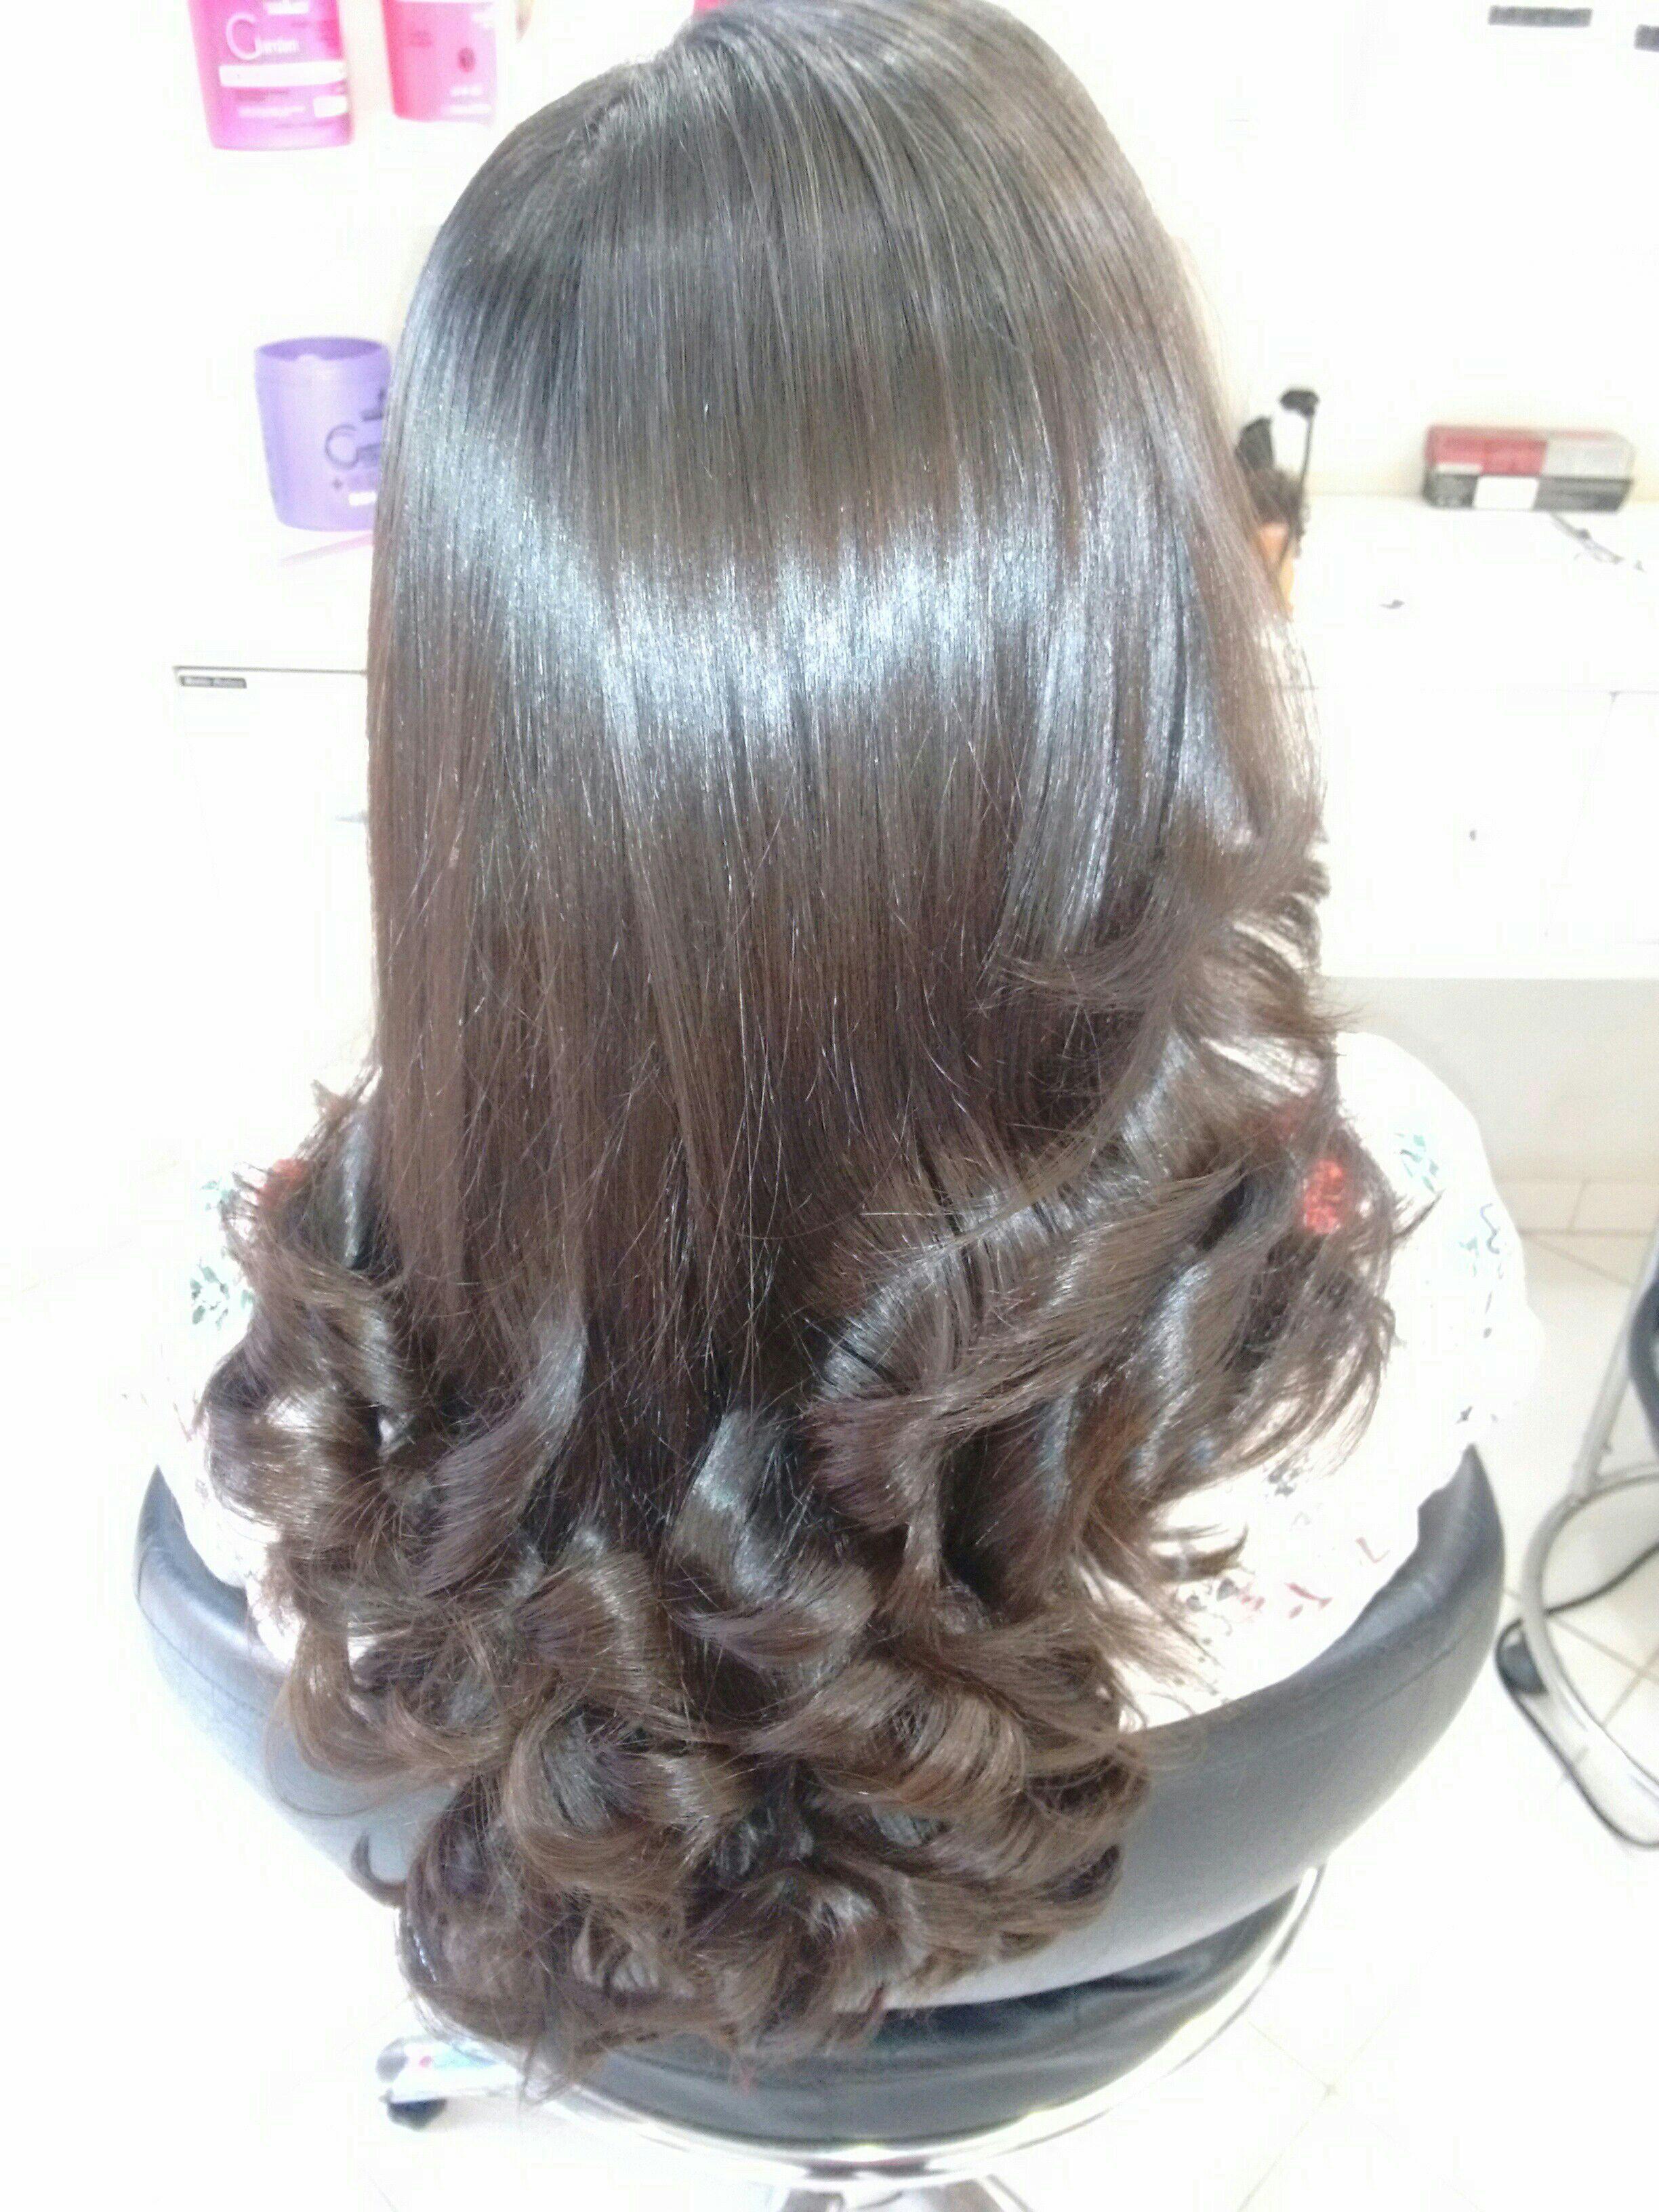 Escova modeladora cabelo cabeleireiro(a) cabeleireiro(a)